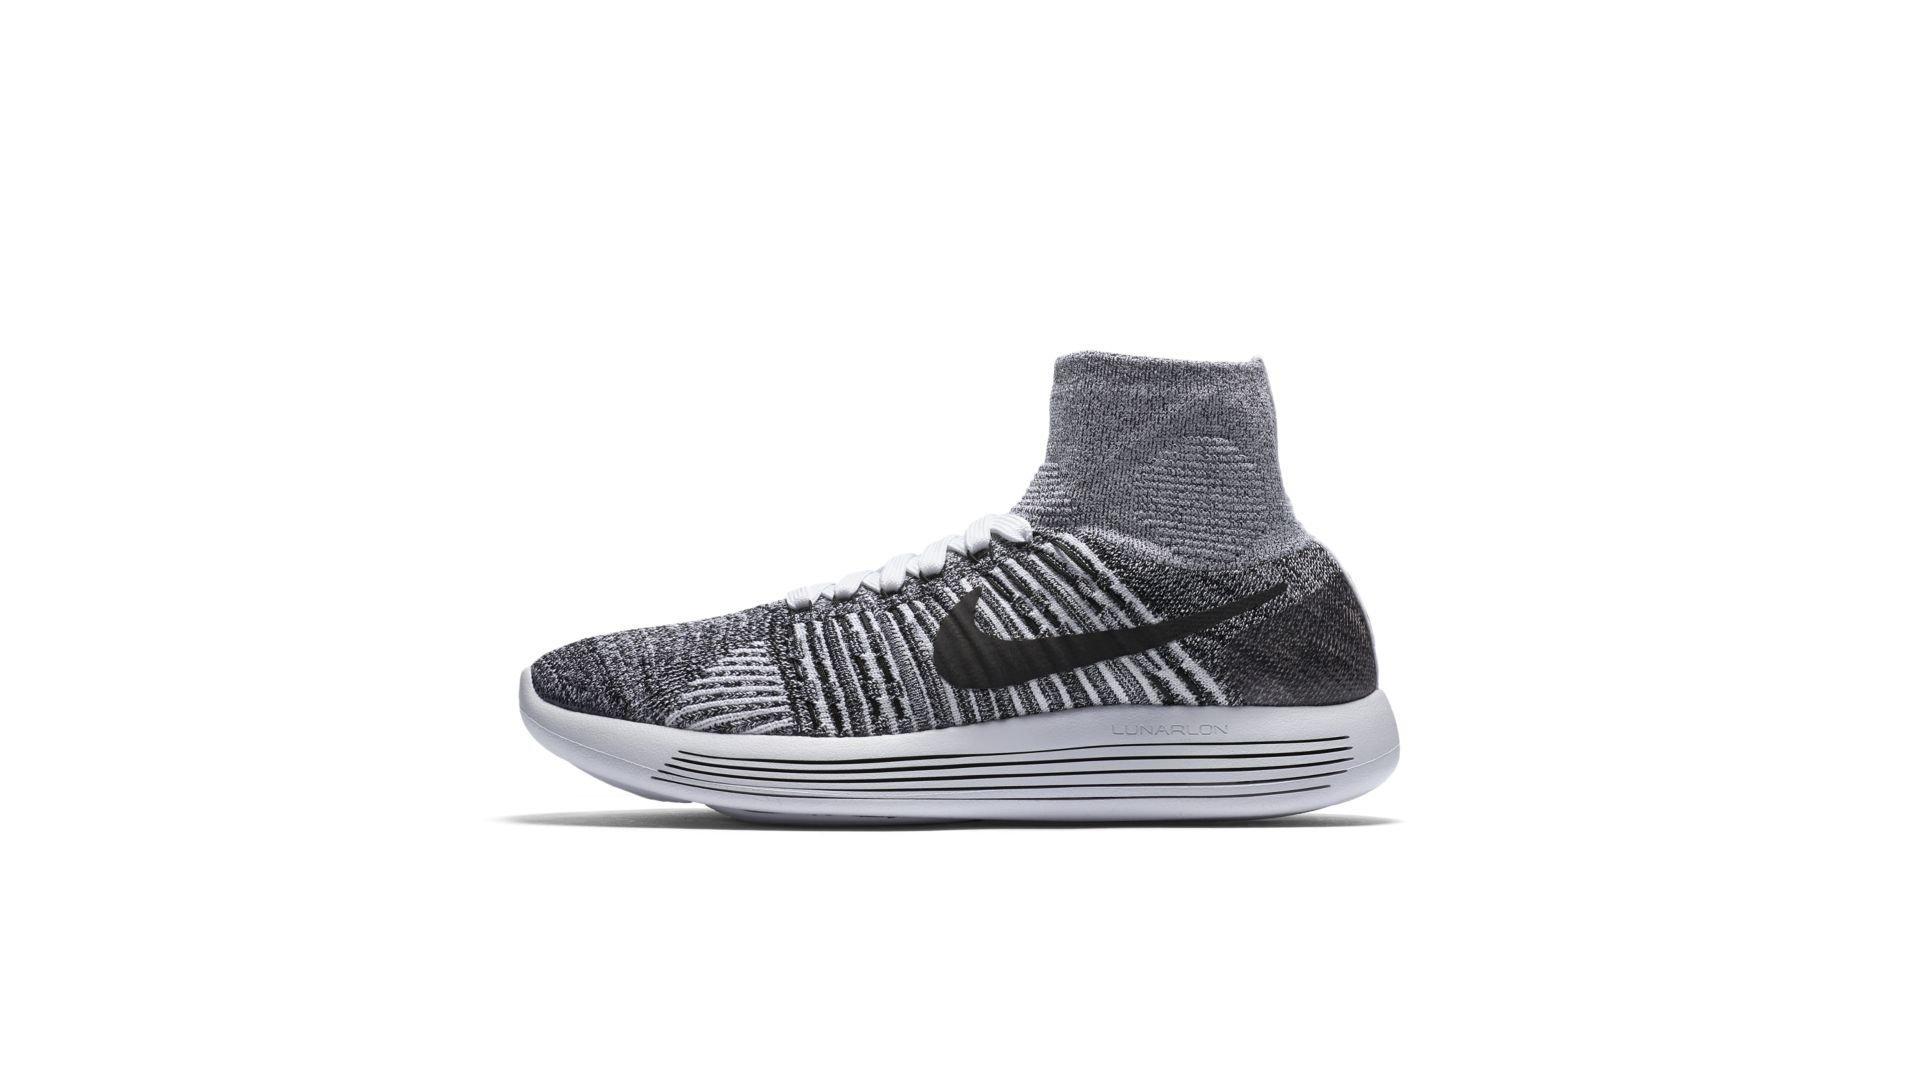 Nike Lunarepic Flyknit White Black (W) (818677-101)